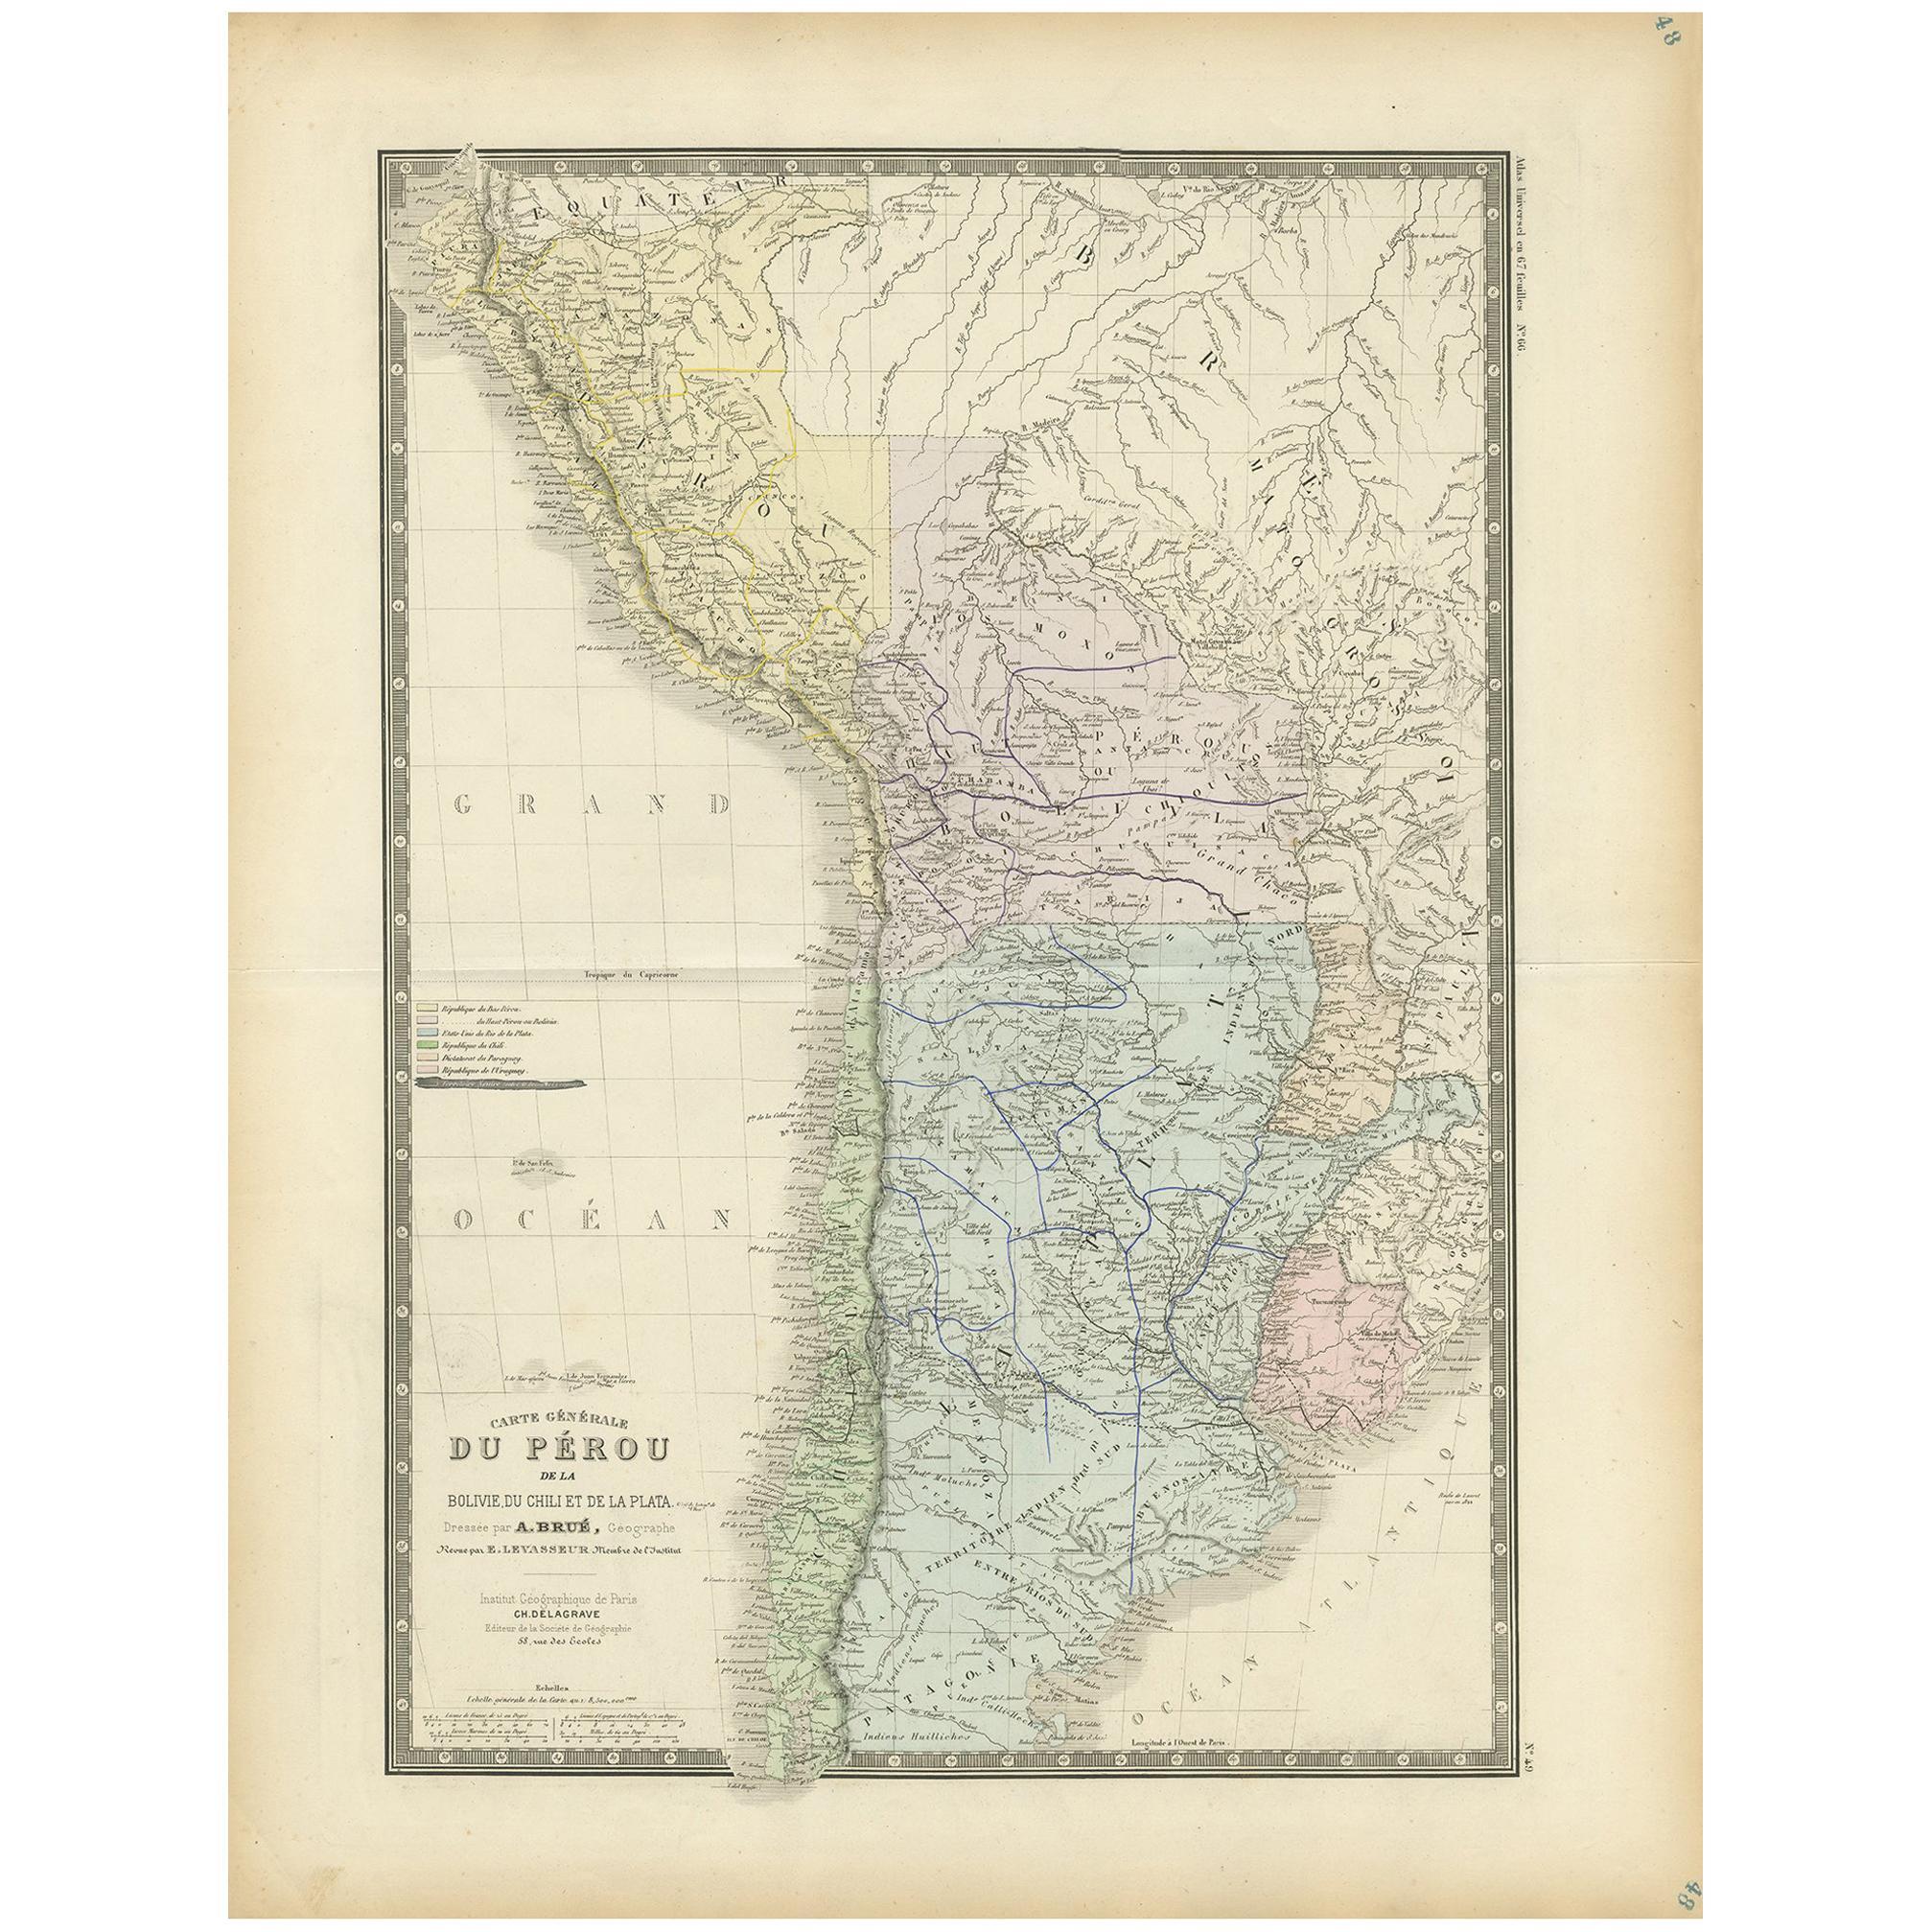 Antique Map of Peru by Levasseur, 1875